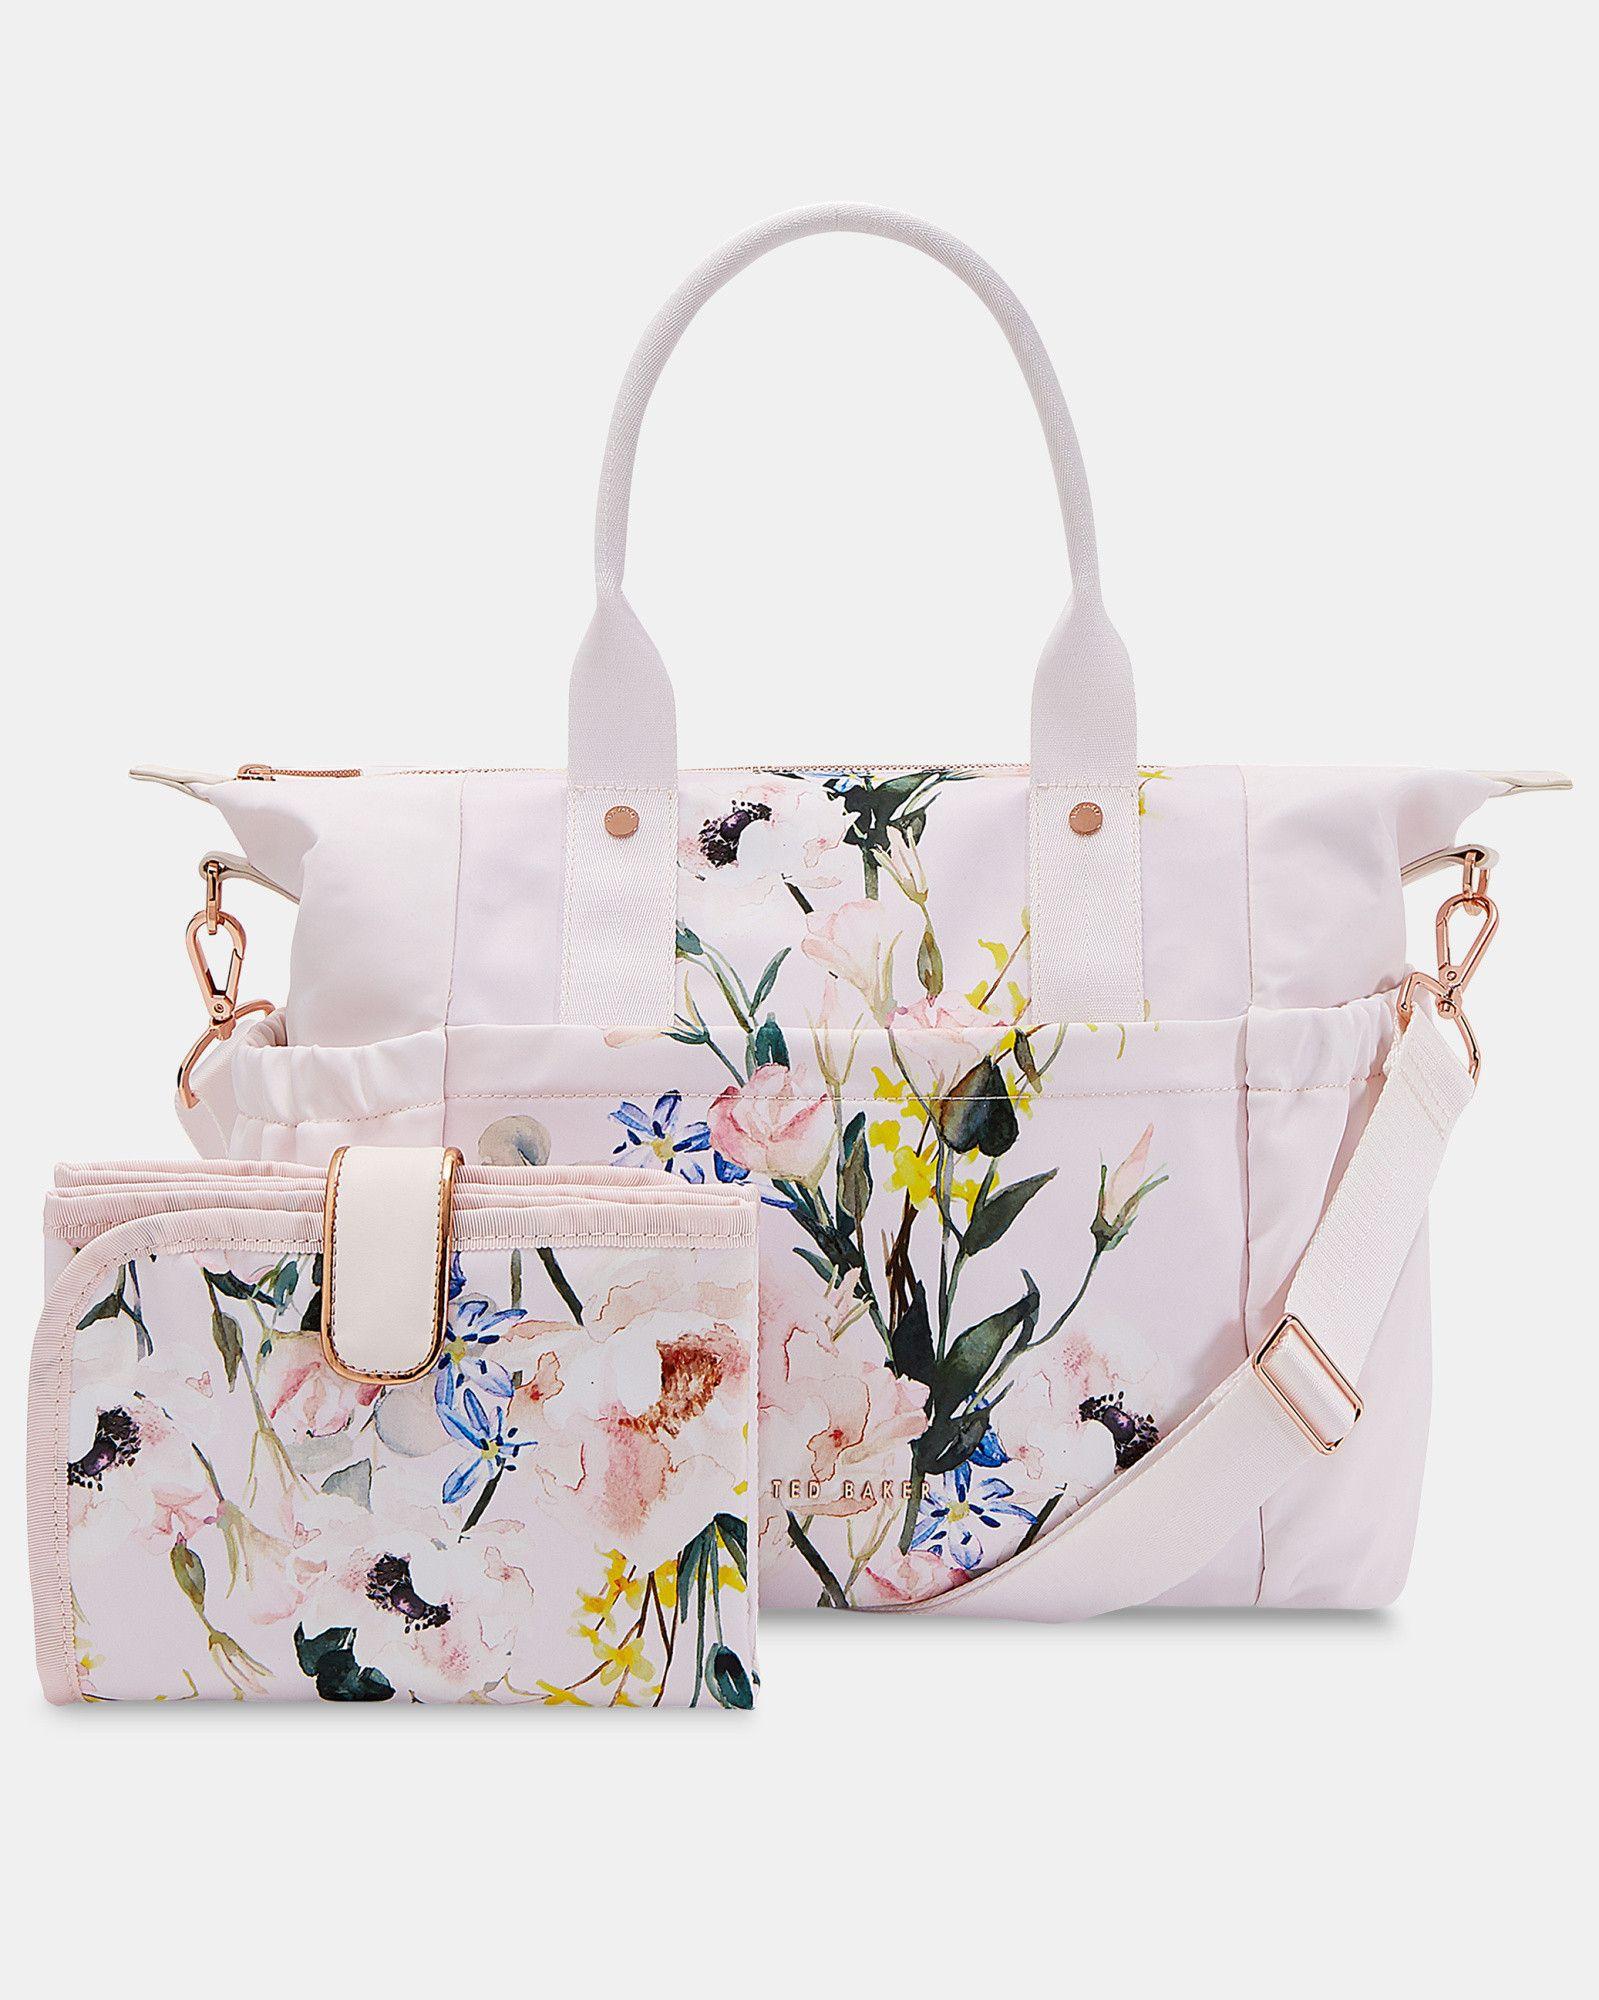 Bnwt Ted Baker Black Opal Nylon Tote /& Clutch Large Foldaway Shopper Weekend Bag